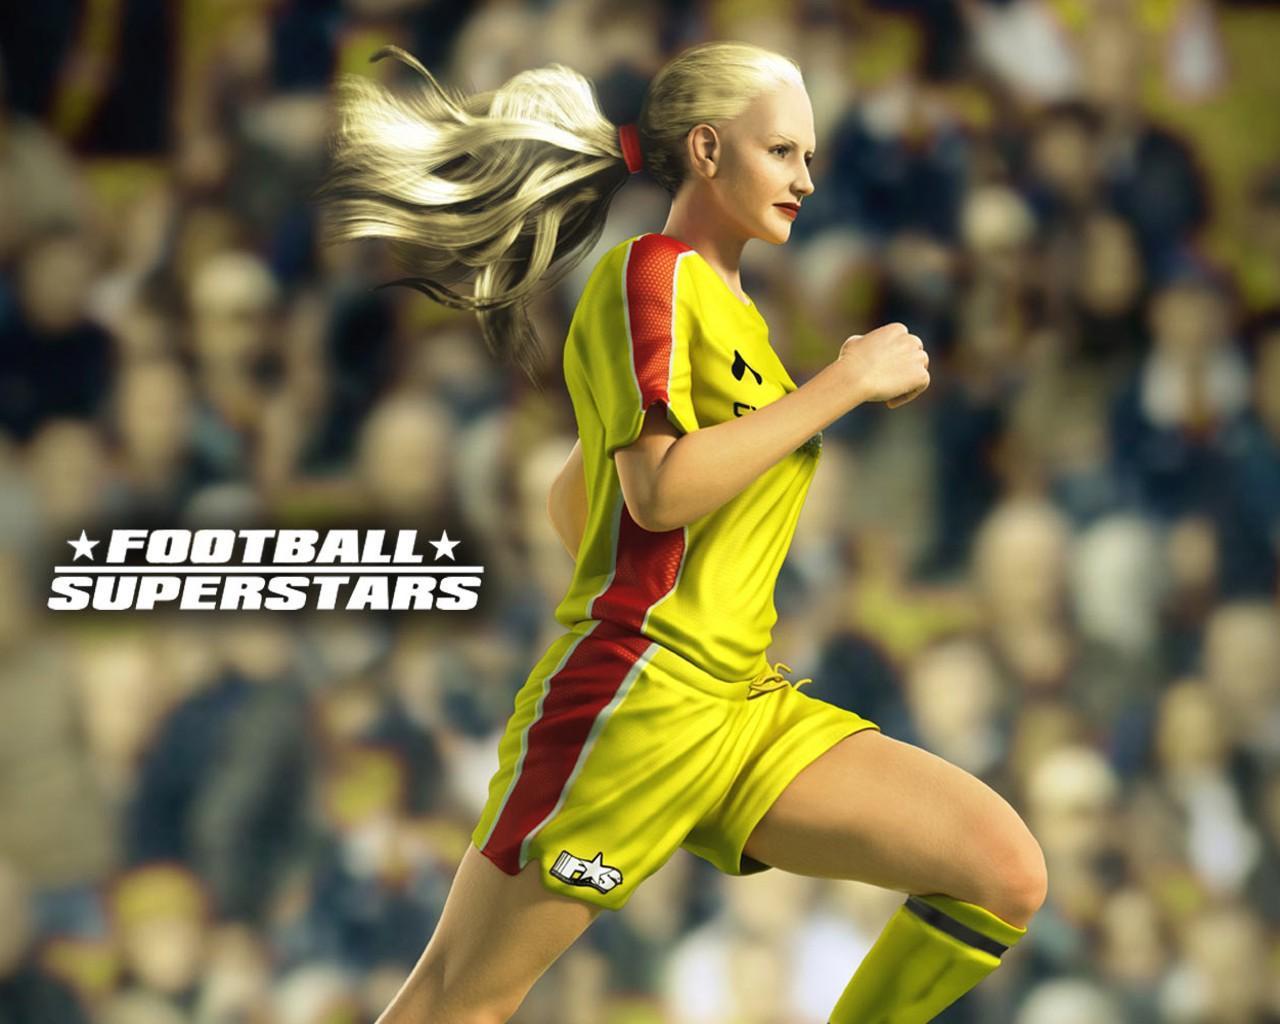 Football Superstars (1)